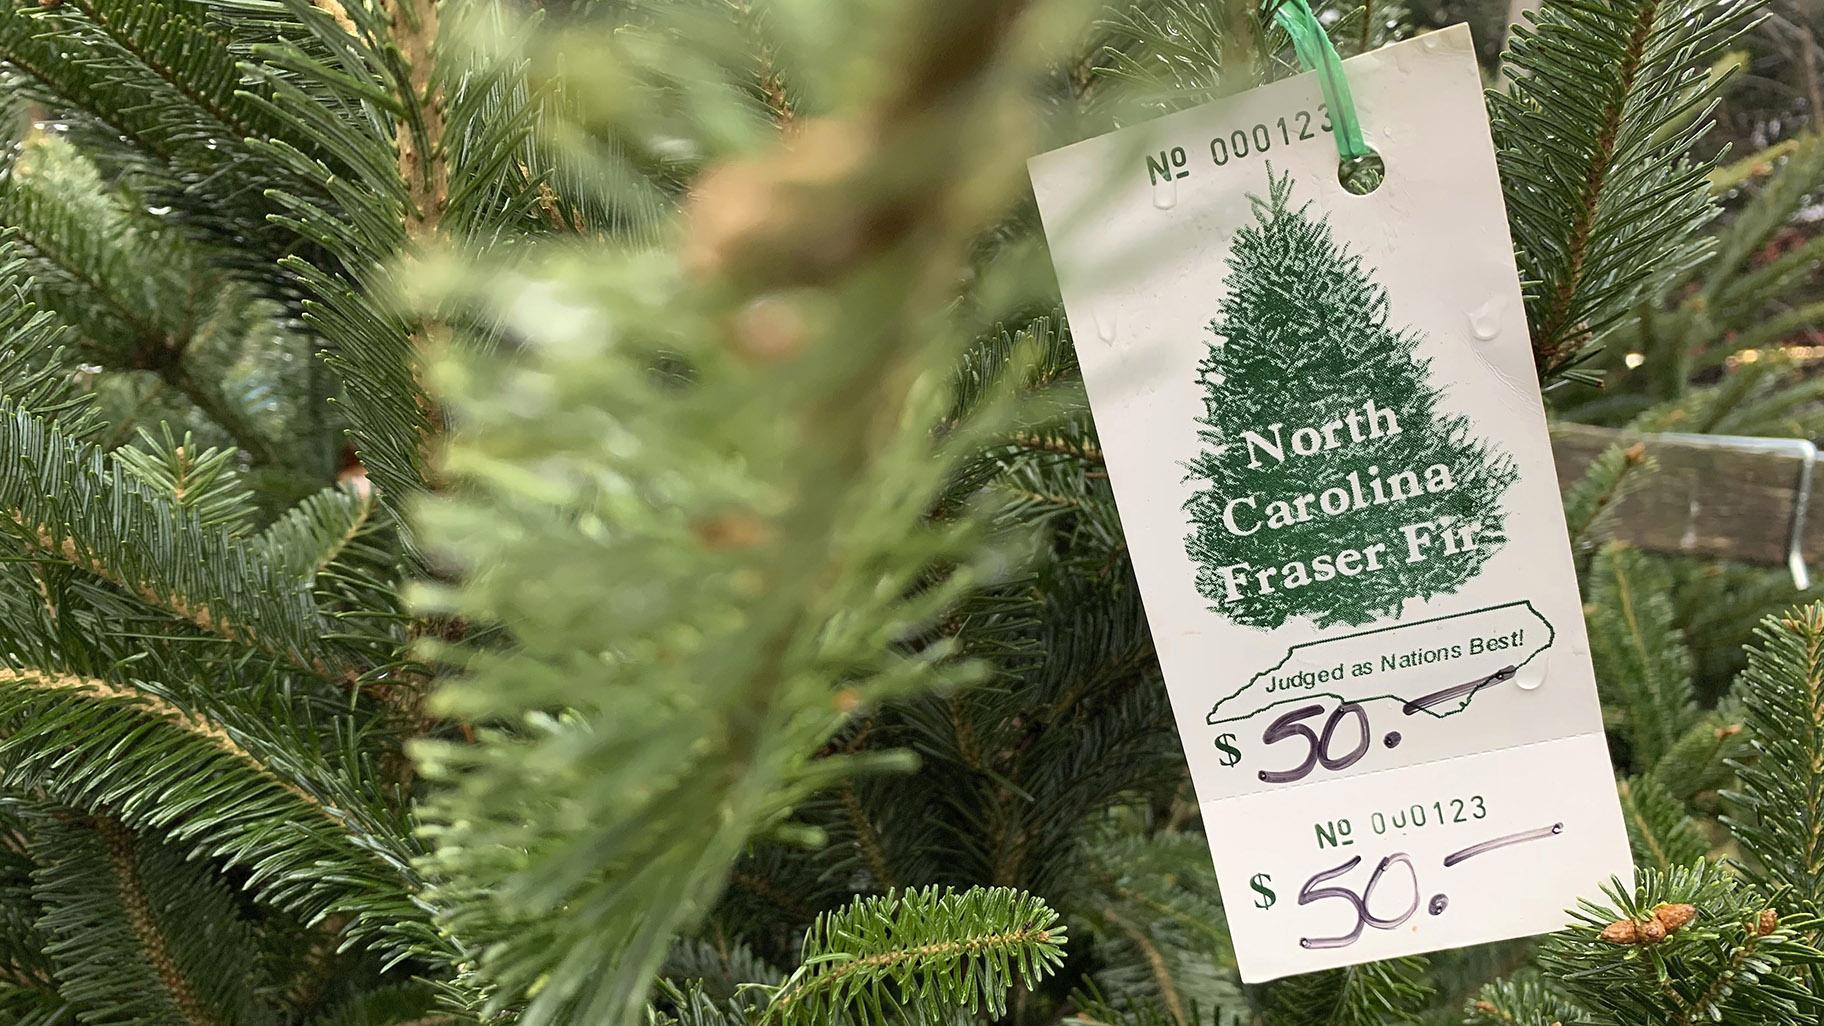 Christmas Tree Shortage North Carolina 2020 Shop Early': US Christmas Trees Supplies Tight, Prices Up